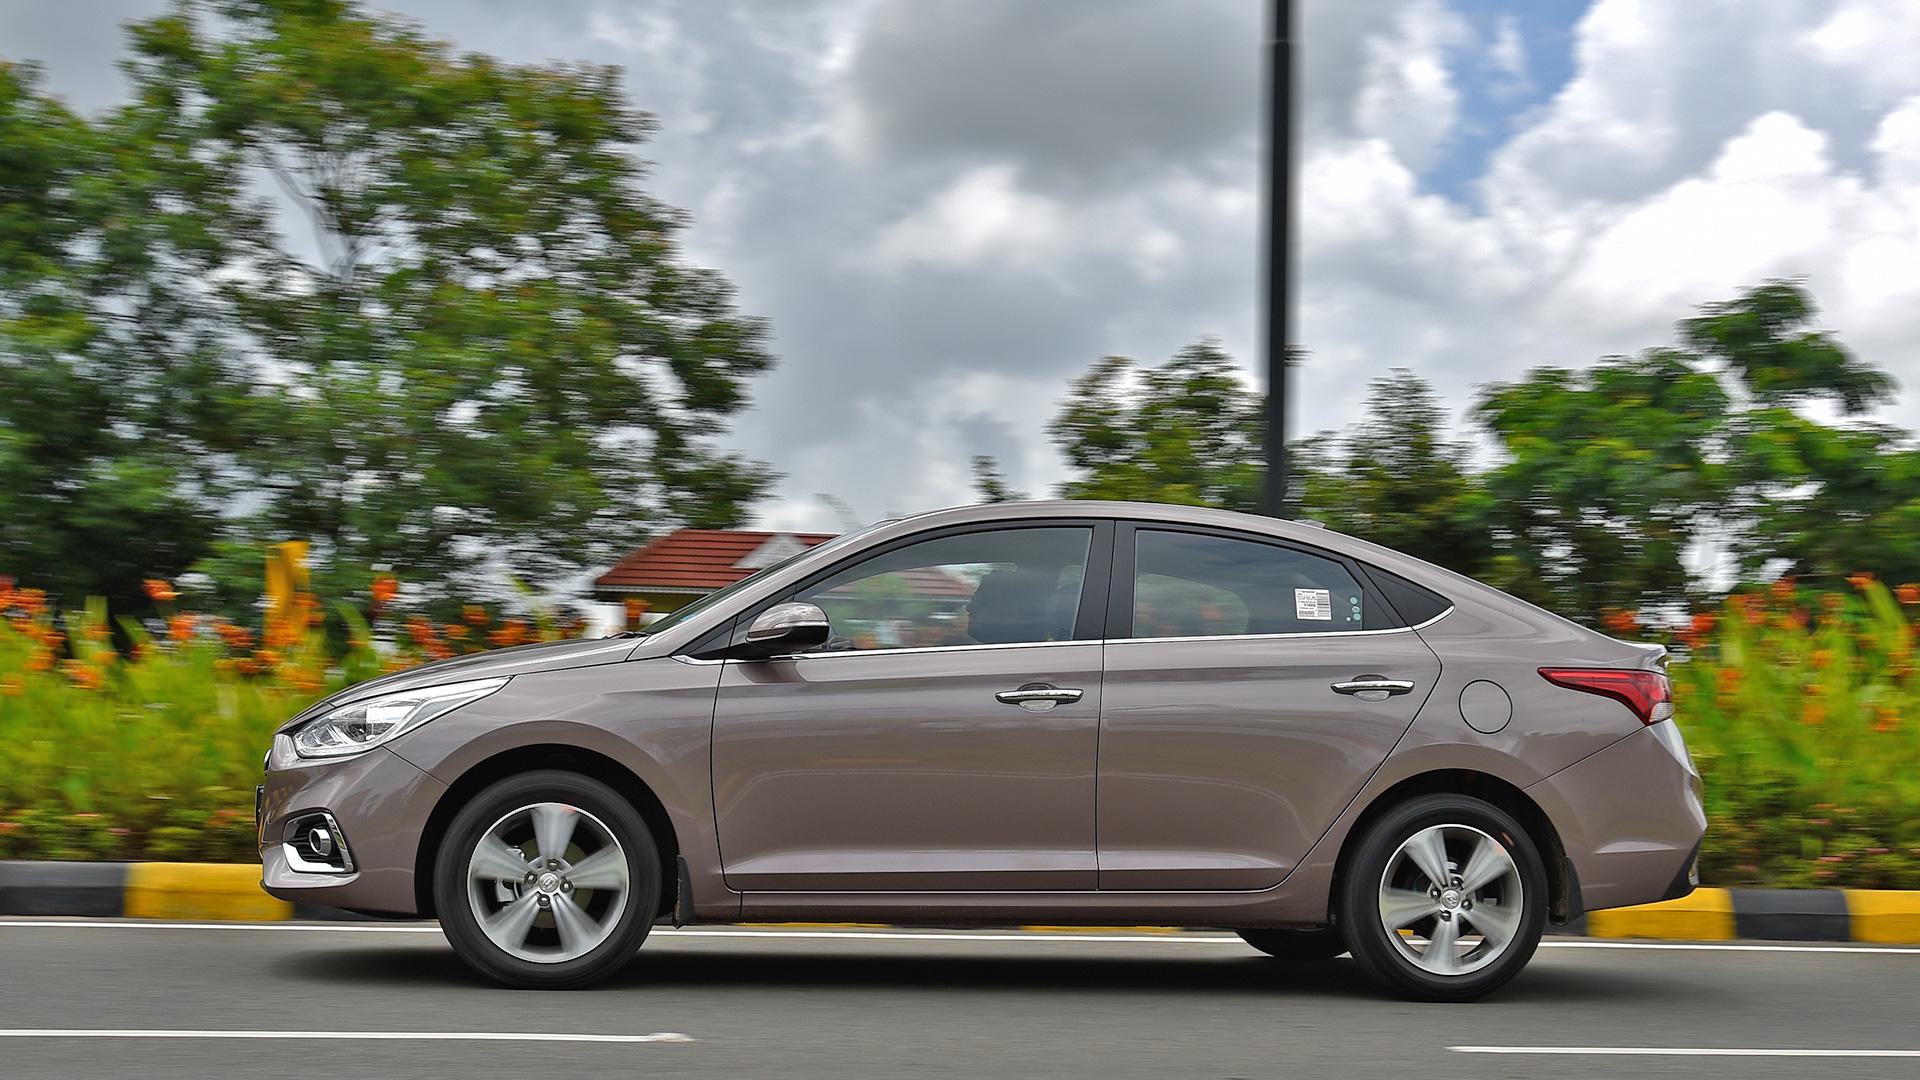 interior all new yaris trd sportivo harga mobil grand avanza 2015 hyundai verna 2018 - price, mileage, reviews ...